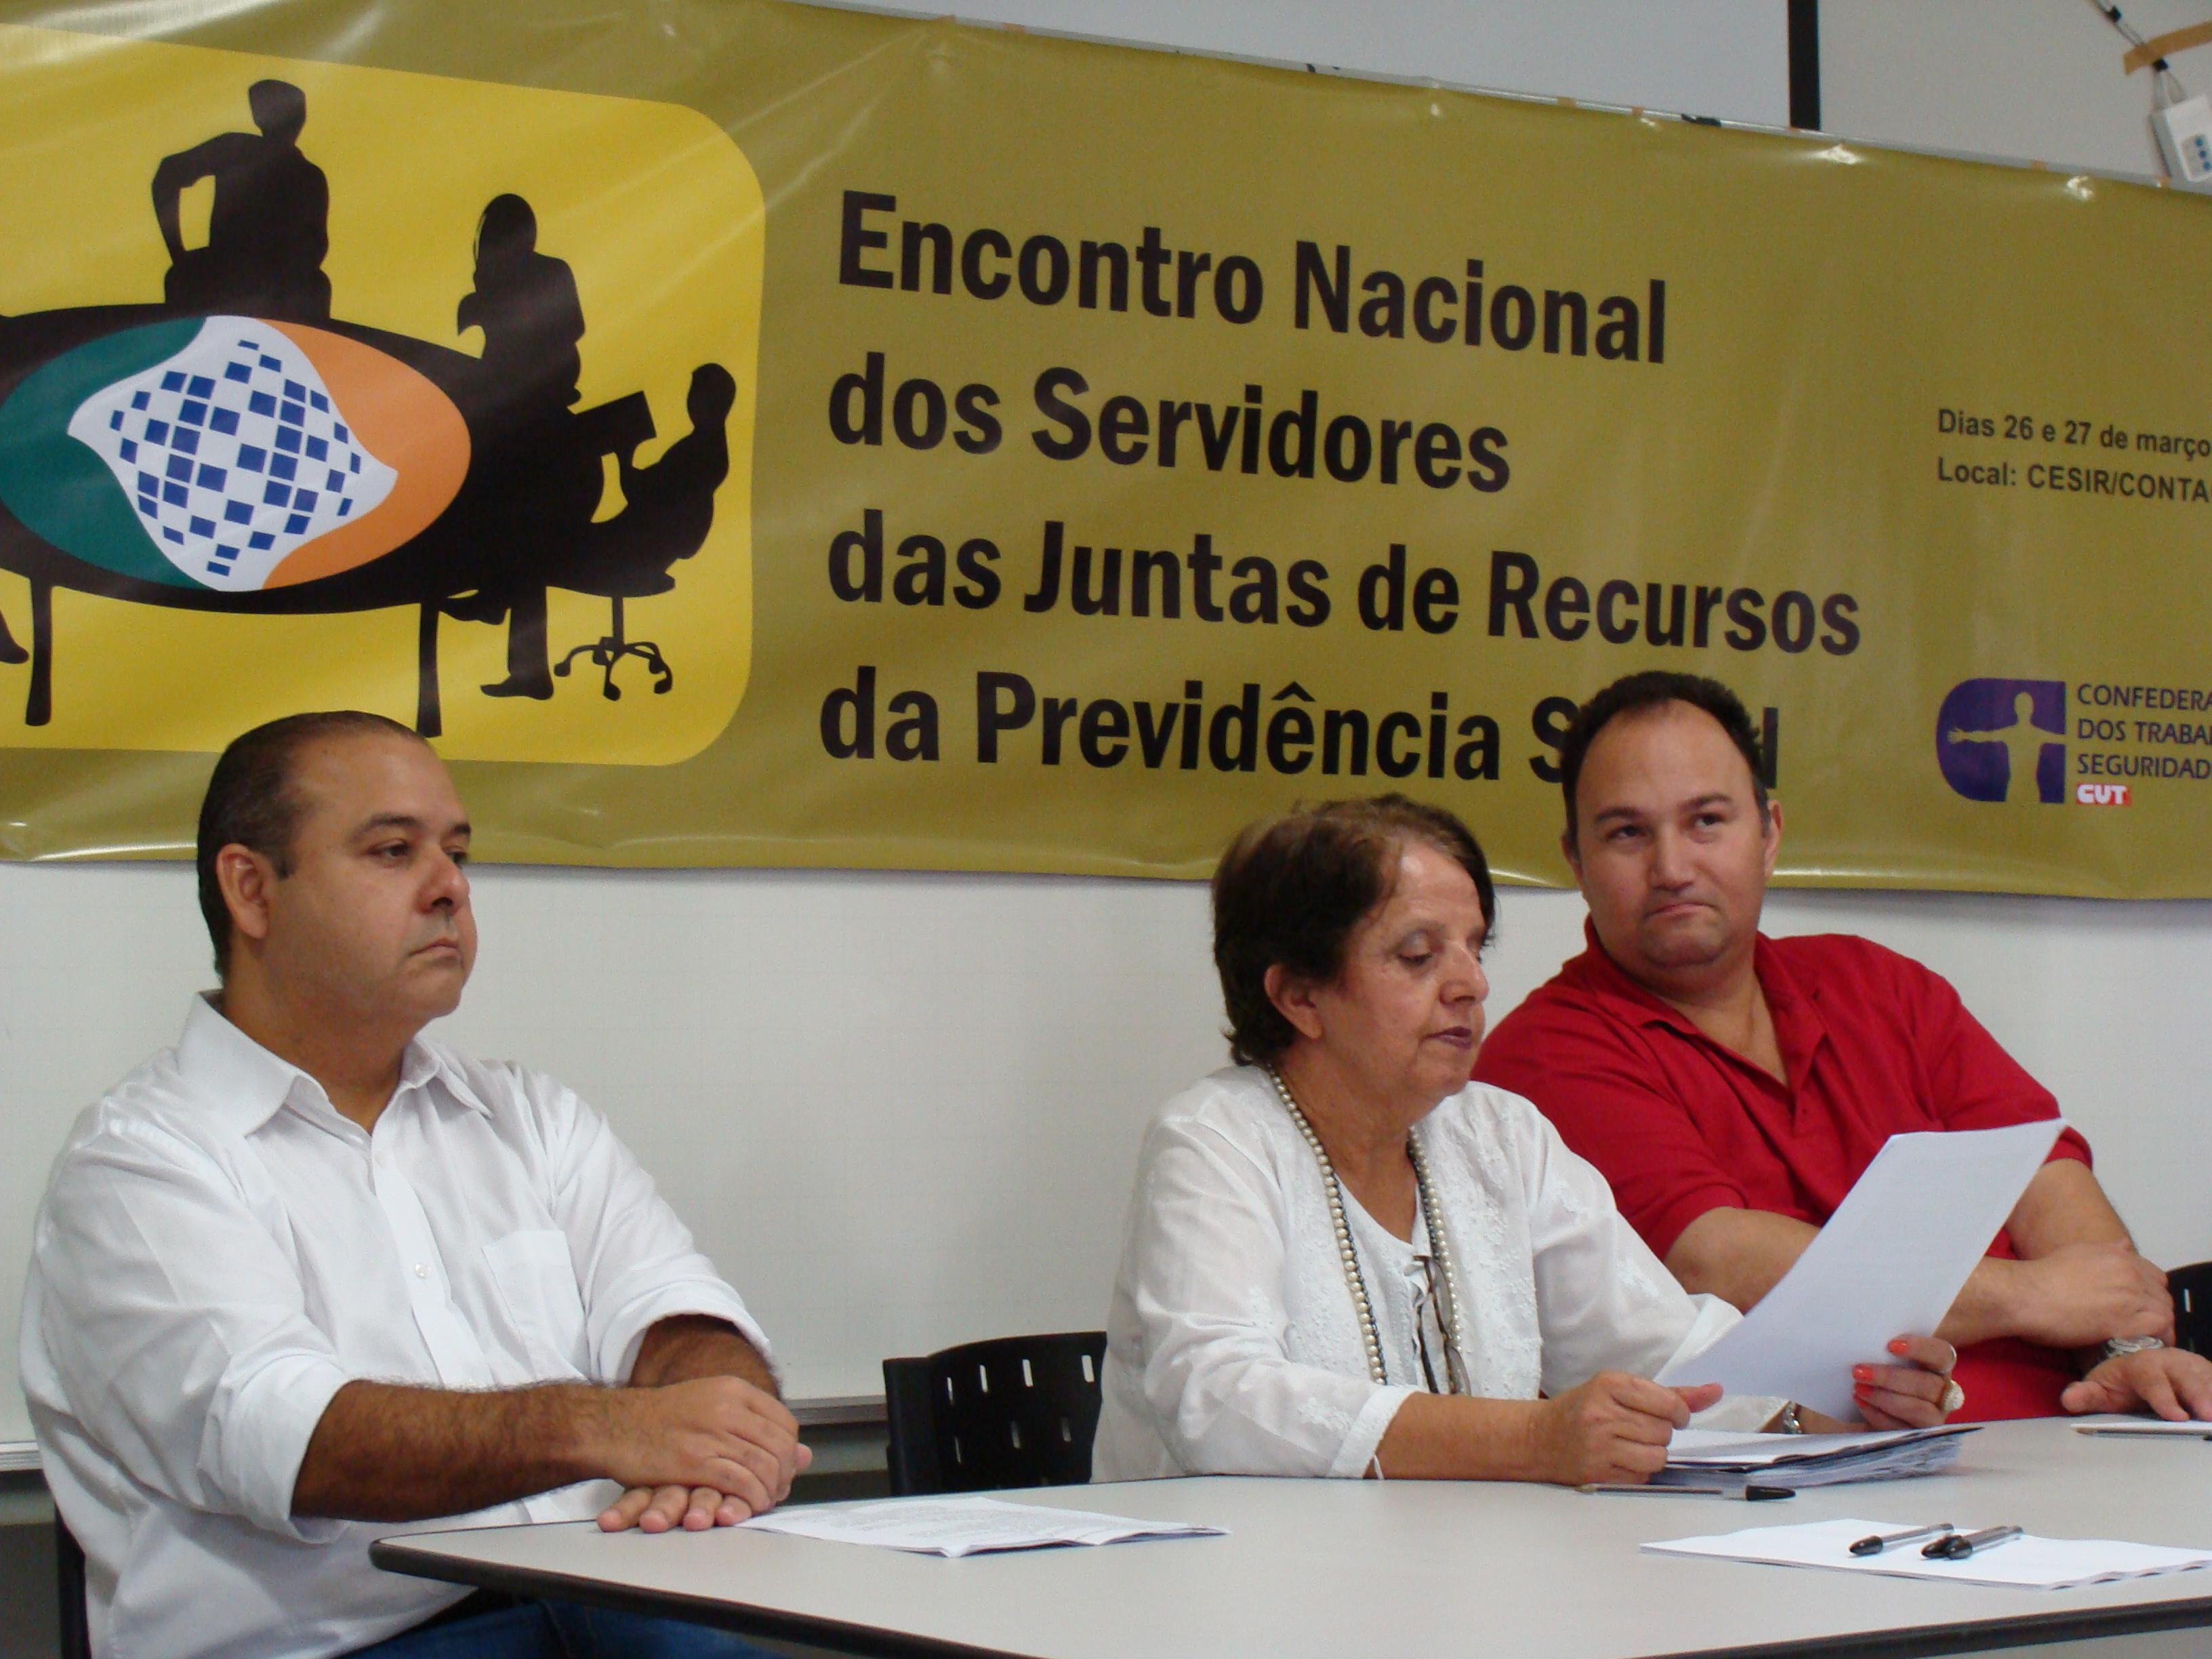 https://crpsjuntasderecursos.files.wordpress.com/2015/04/encontro-nacional-dos-servidores-das-juntas-de-recursos-da-previdc3aancia_brasc3adlia_-26-e-27032015-26.jpg